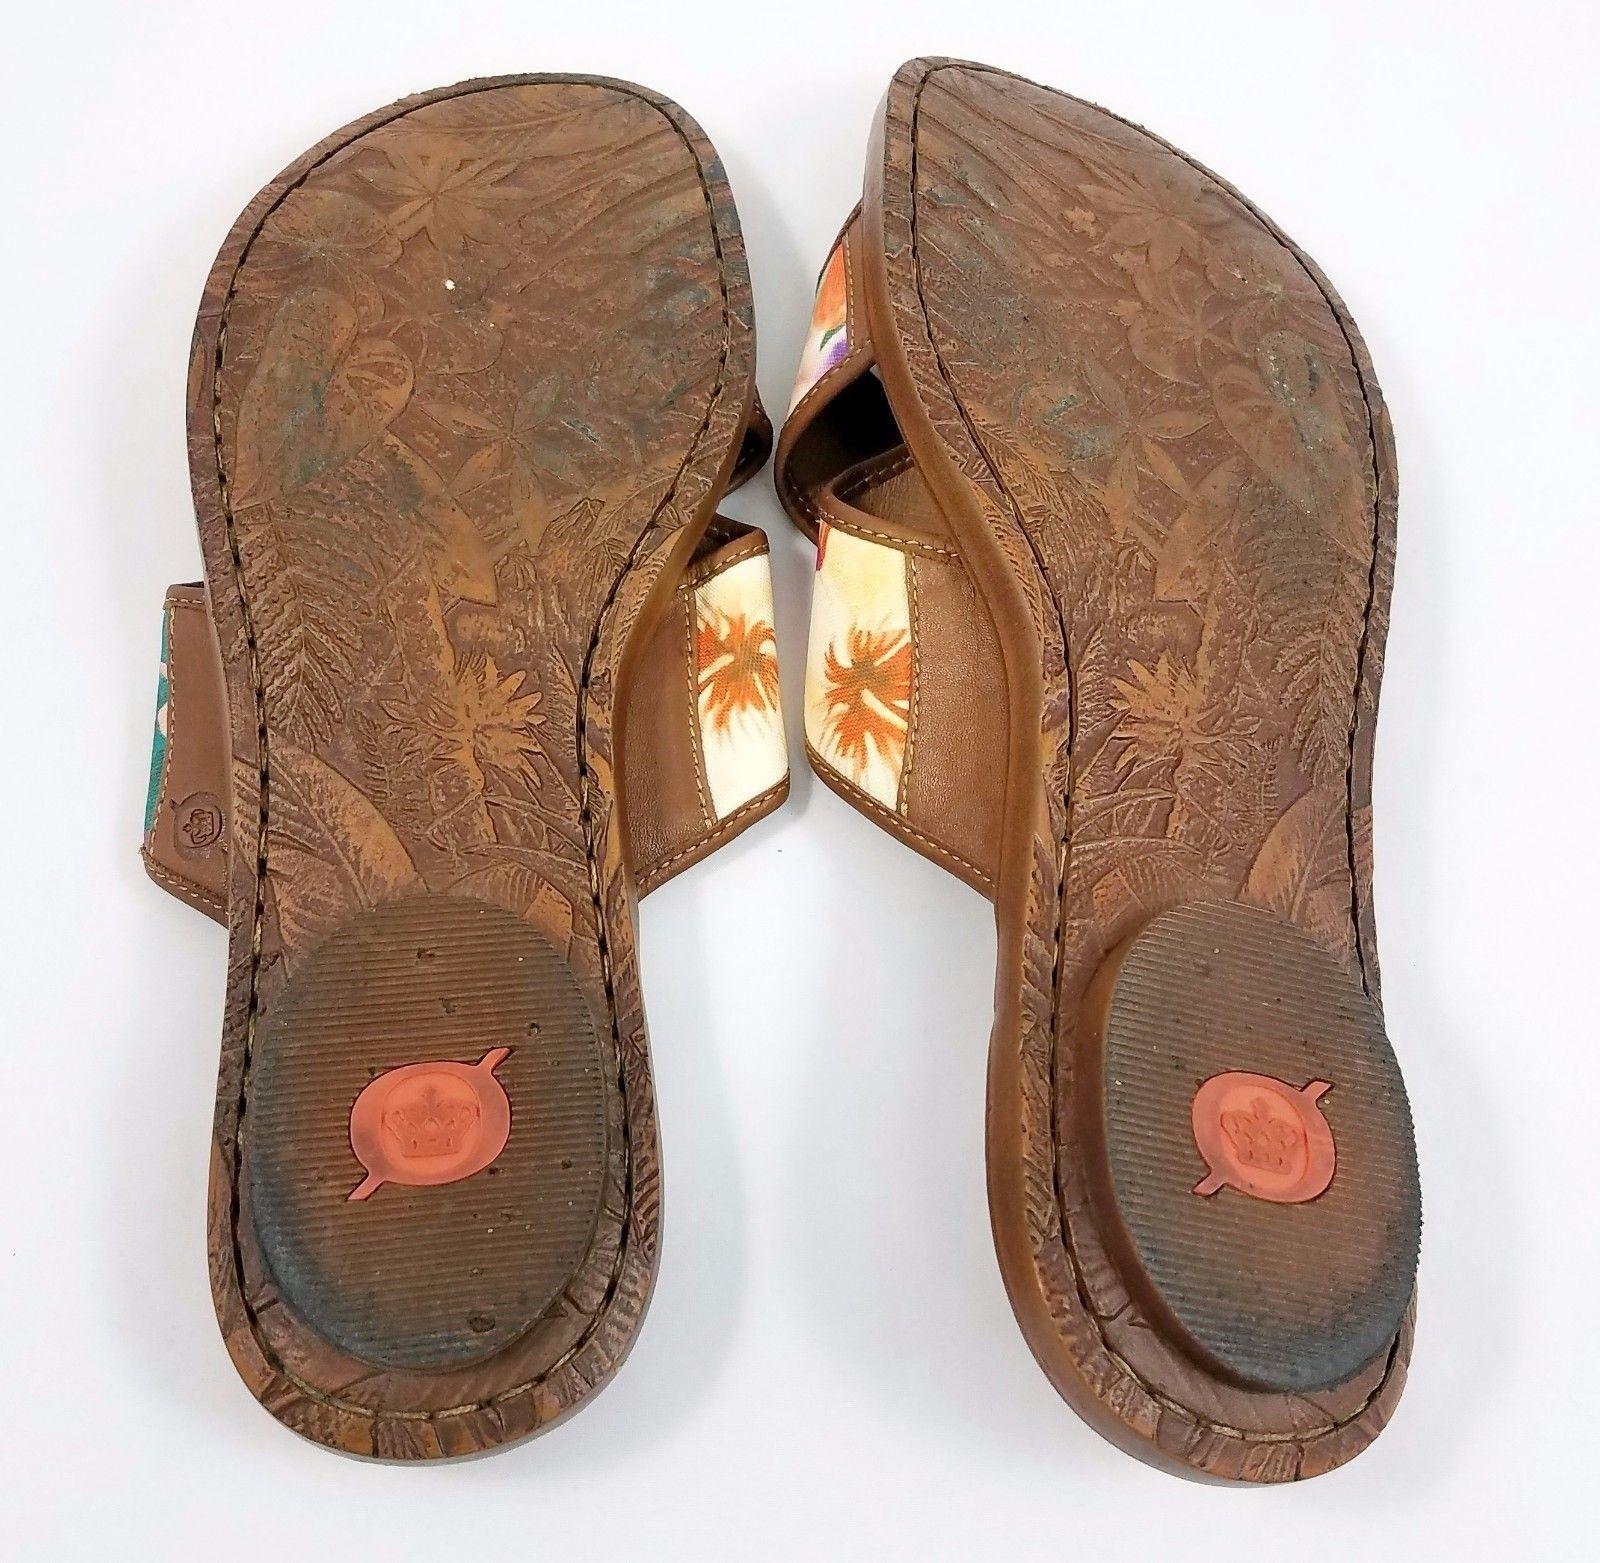 d7d8225dae9a ... Born Brown Leather Multi Color Floral Sandals Slip On Slides Shoes  Womens 10 ...